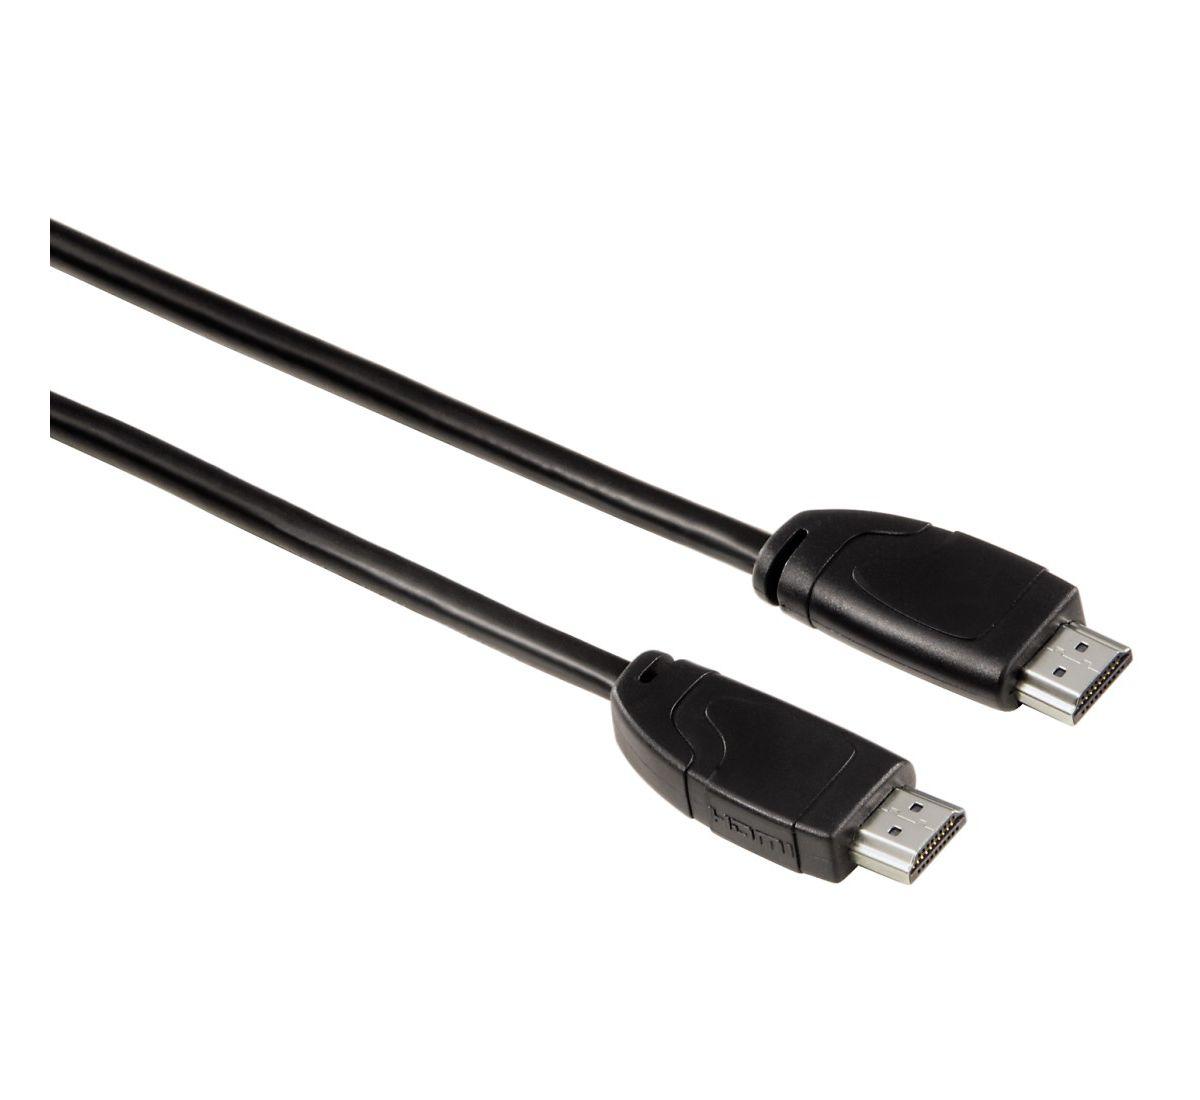 Hama High Speed HDMI-Kabel Stecker - Stecker, E...